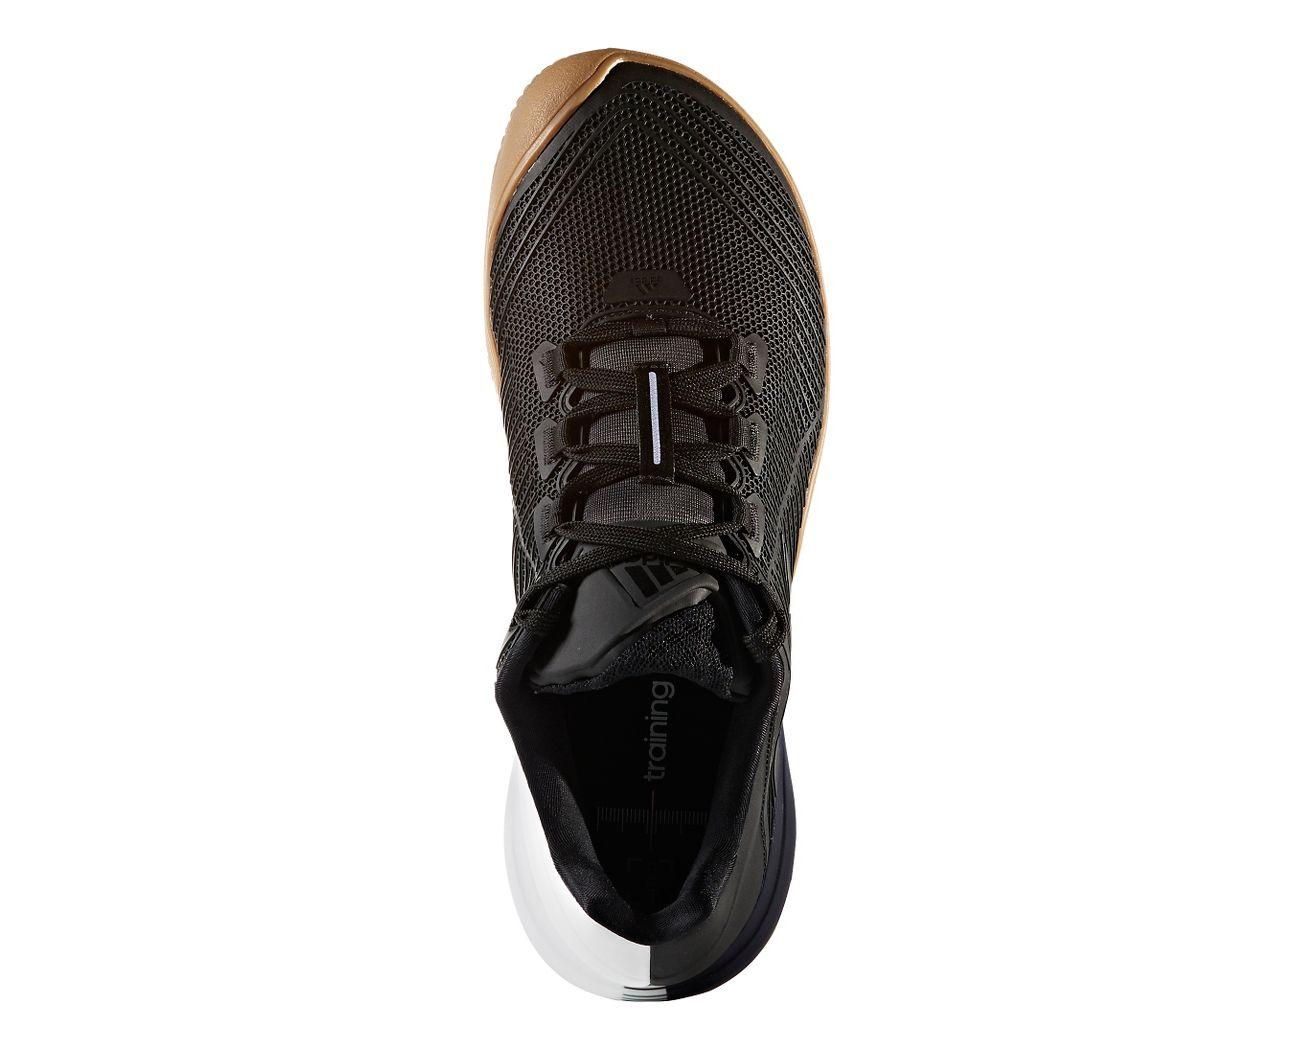 Adidas Crazy Power Shoes Review